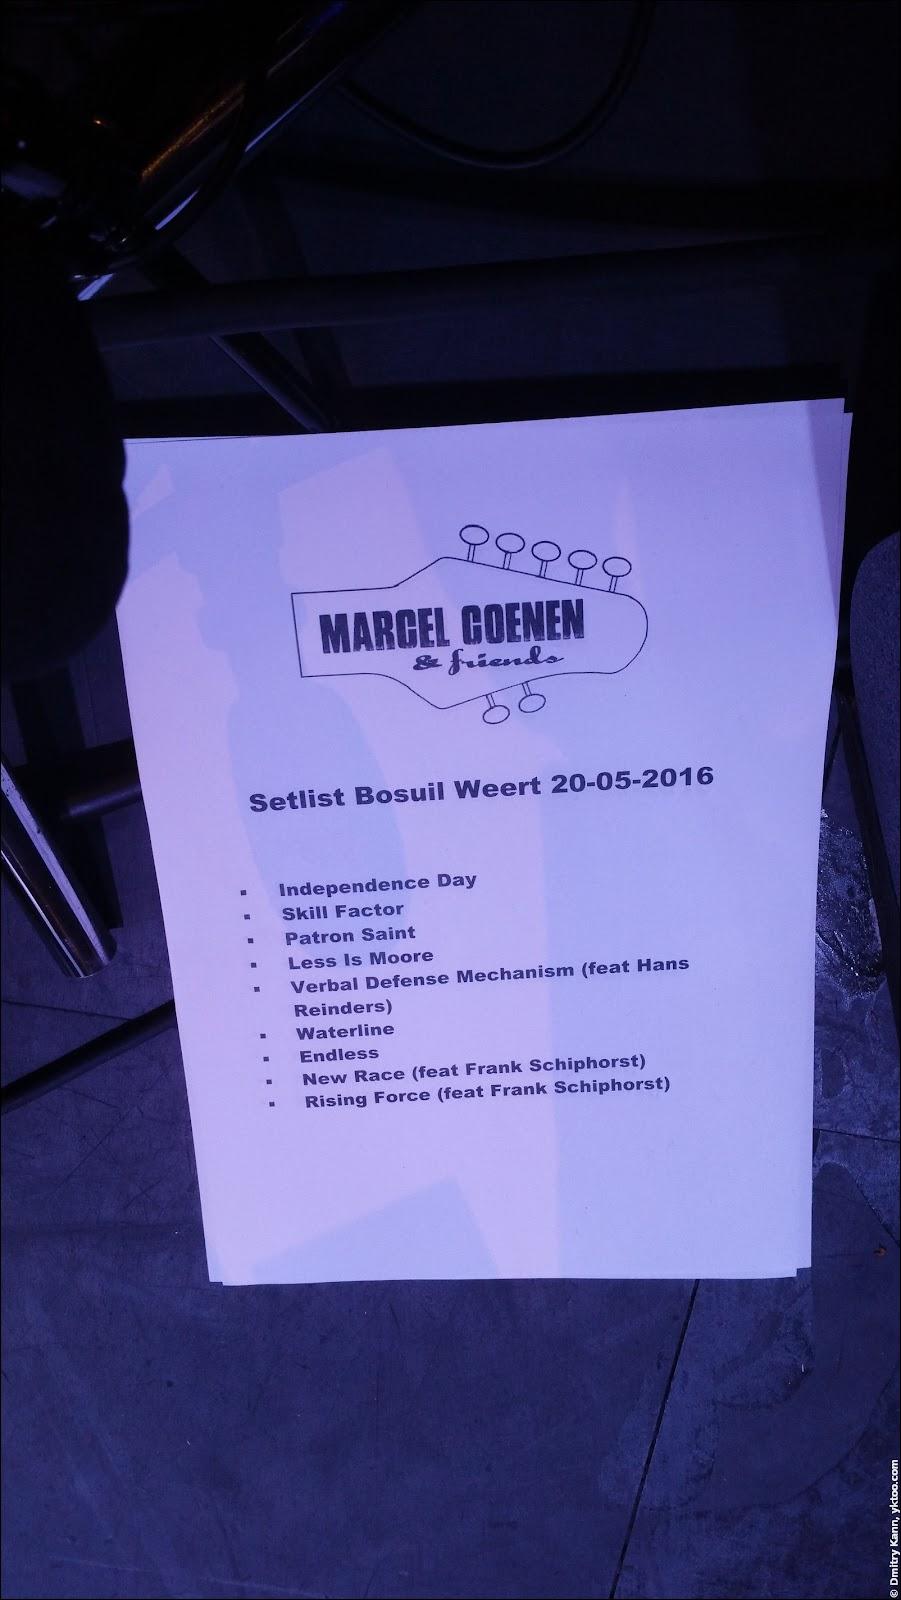 Set-list of Marcel Coenen & Friends.